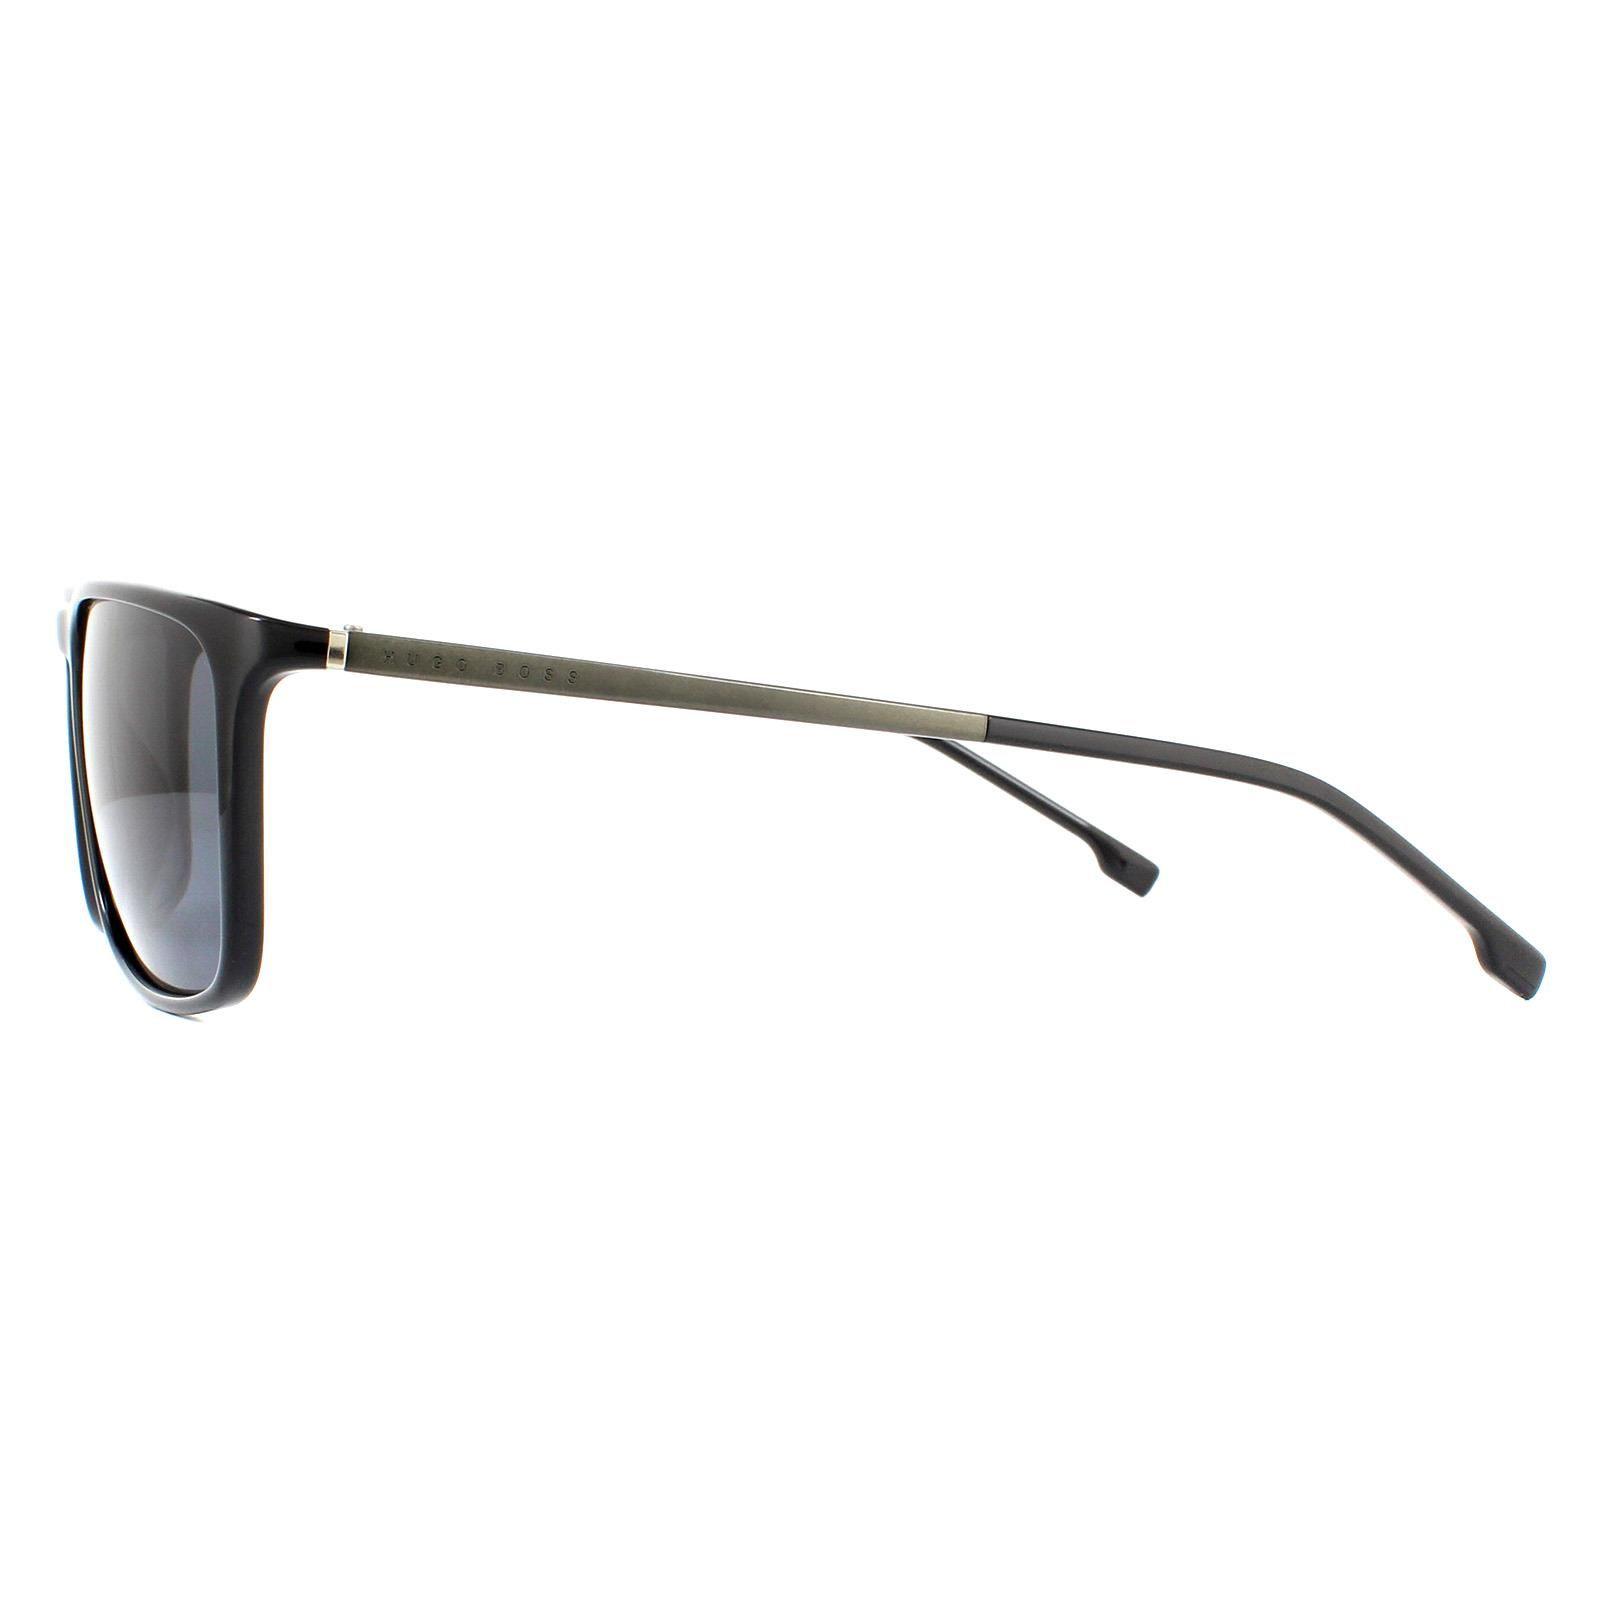 Hugo Boss Sunglasses BOSS 1182/S 807 IR Black Grey Polarized